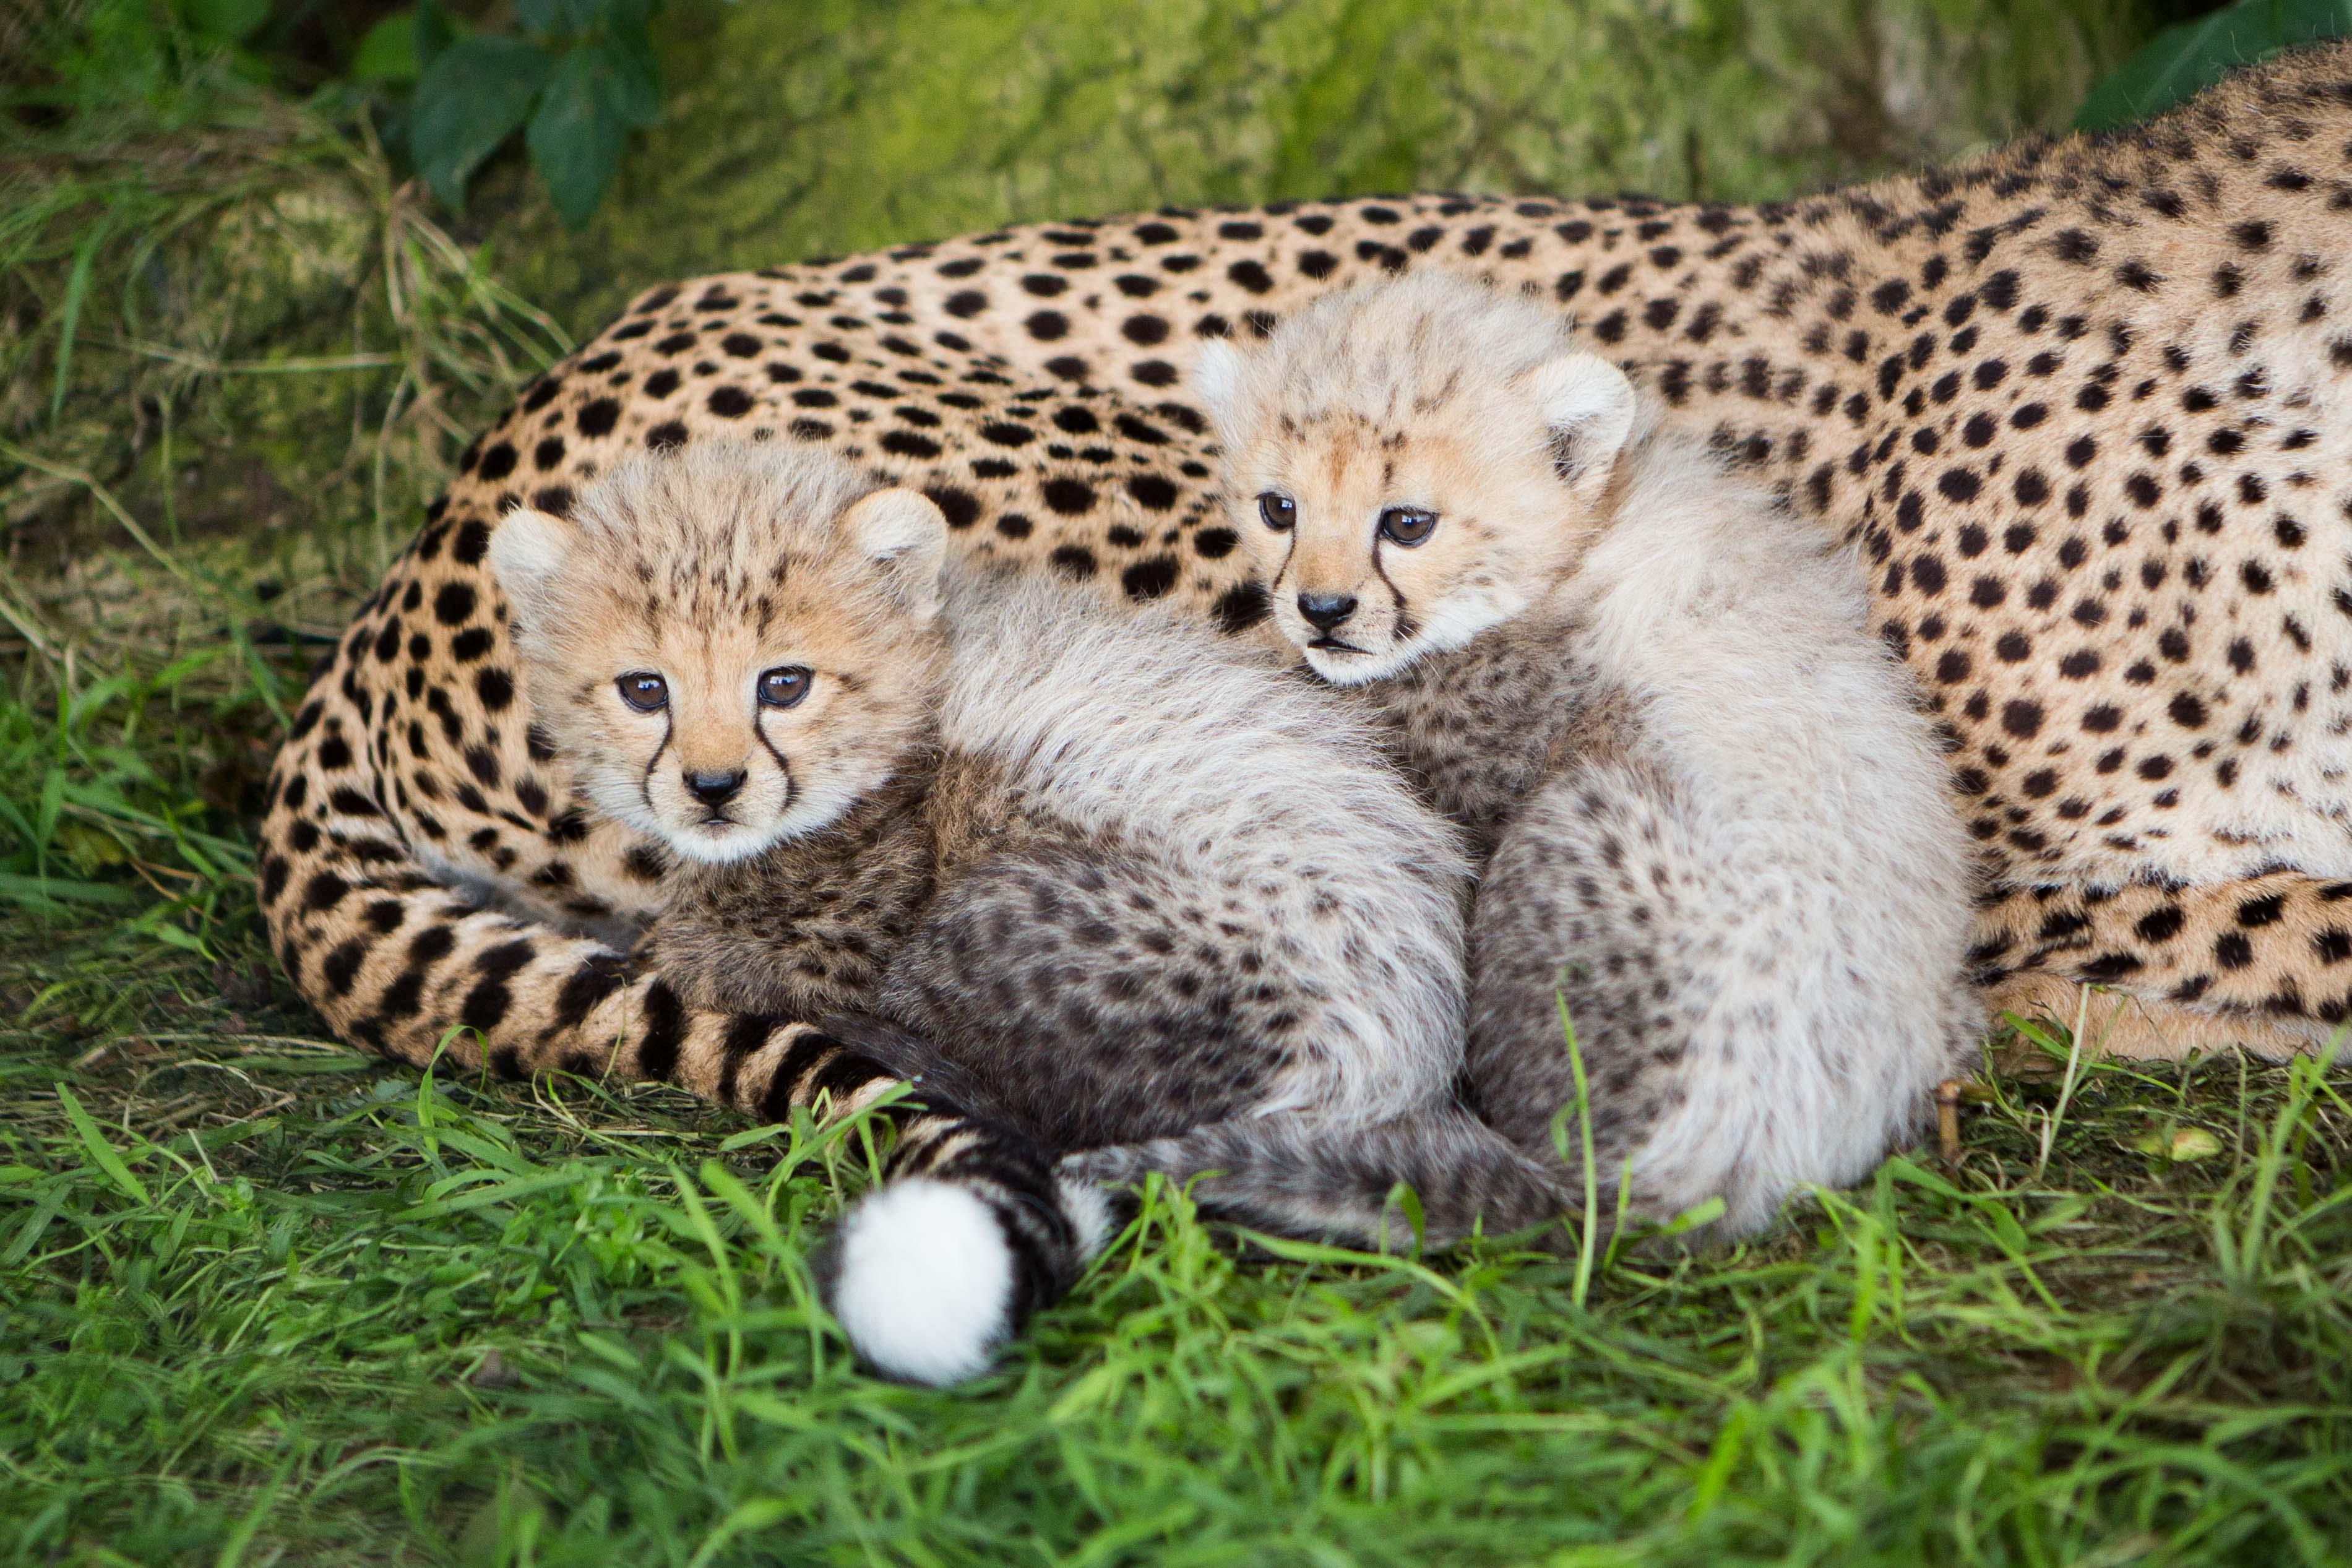 Cheetah_Cubs_in_Fota_Need_a_name_1